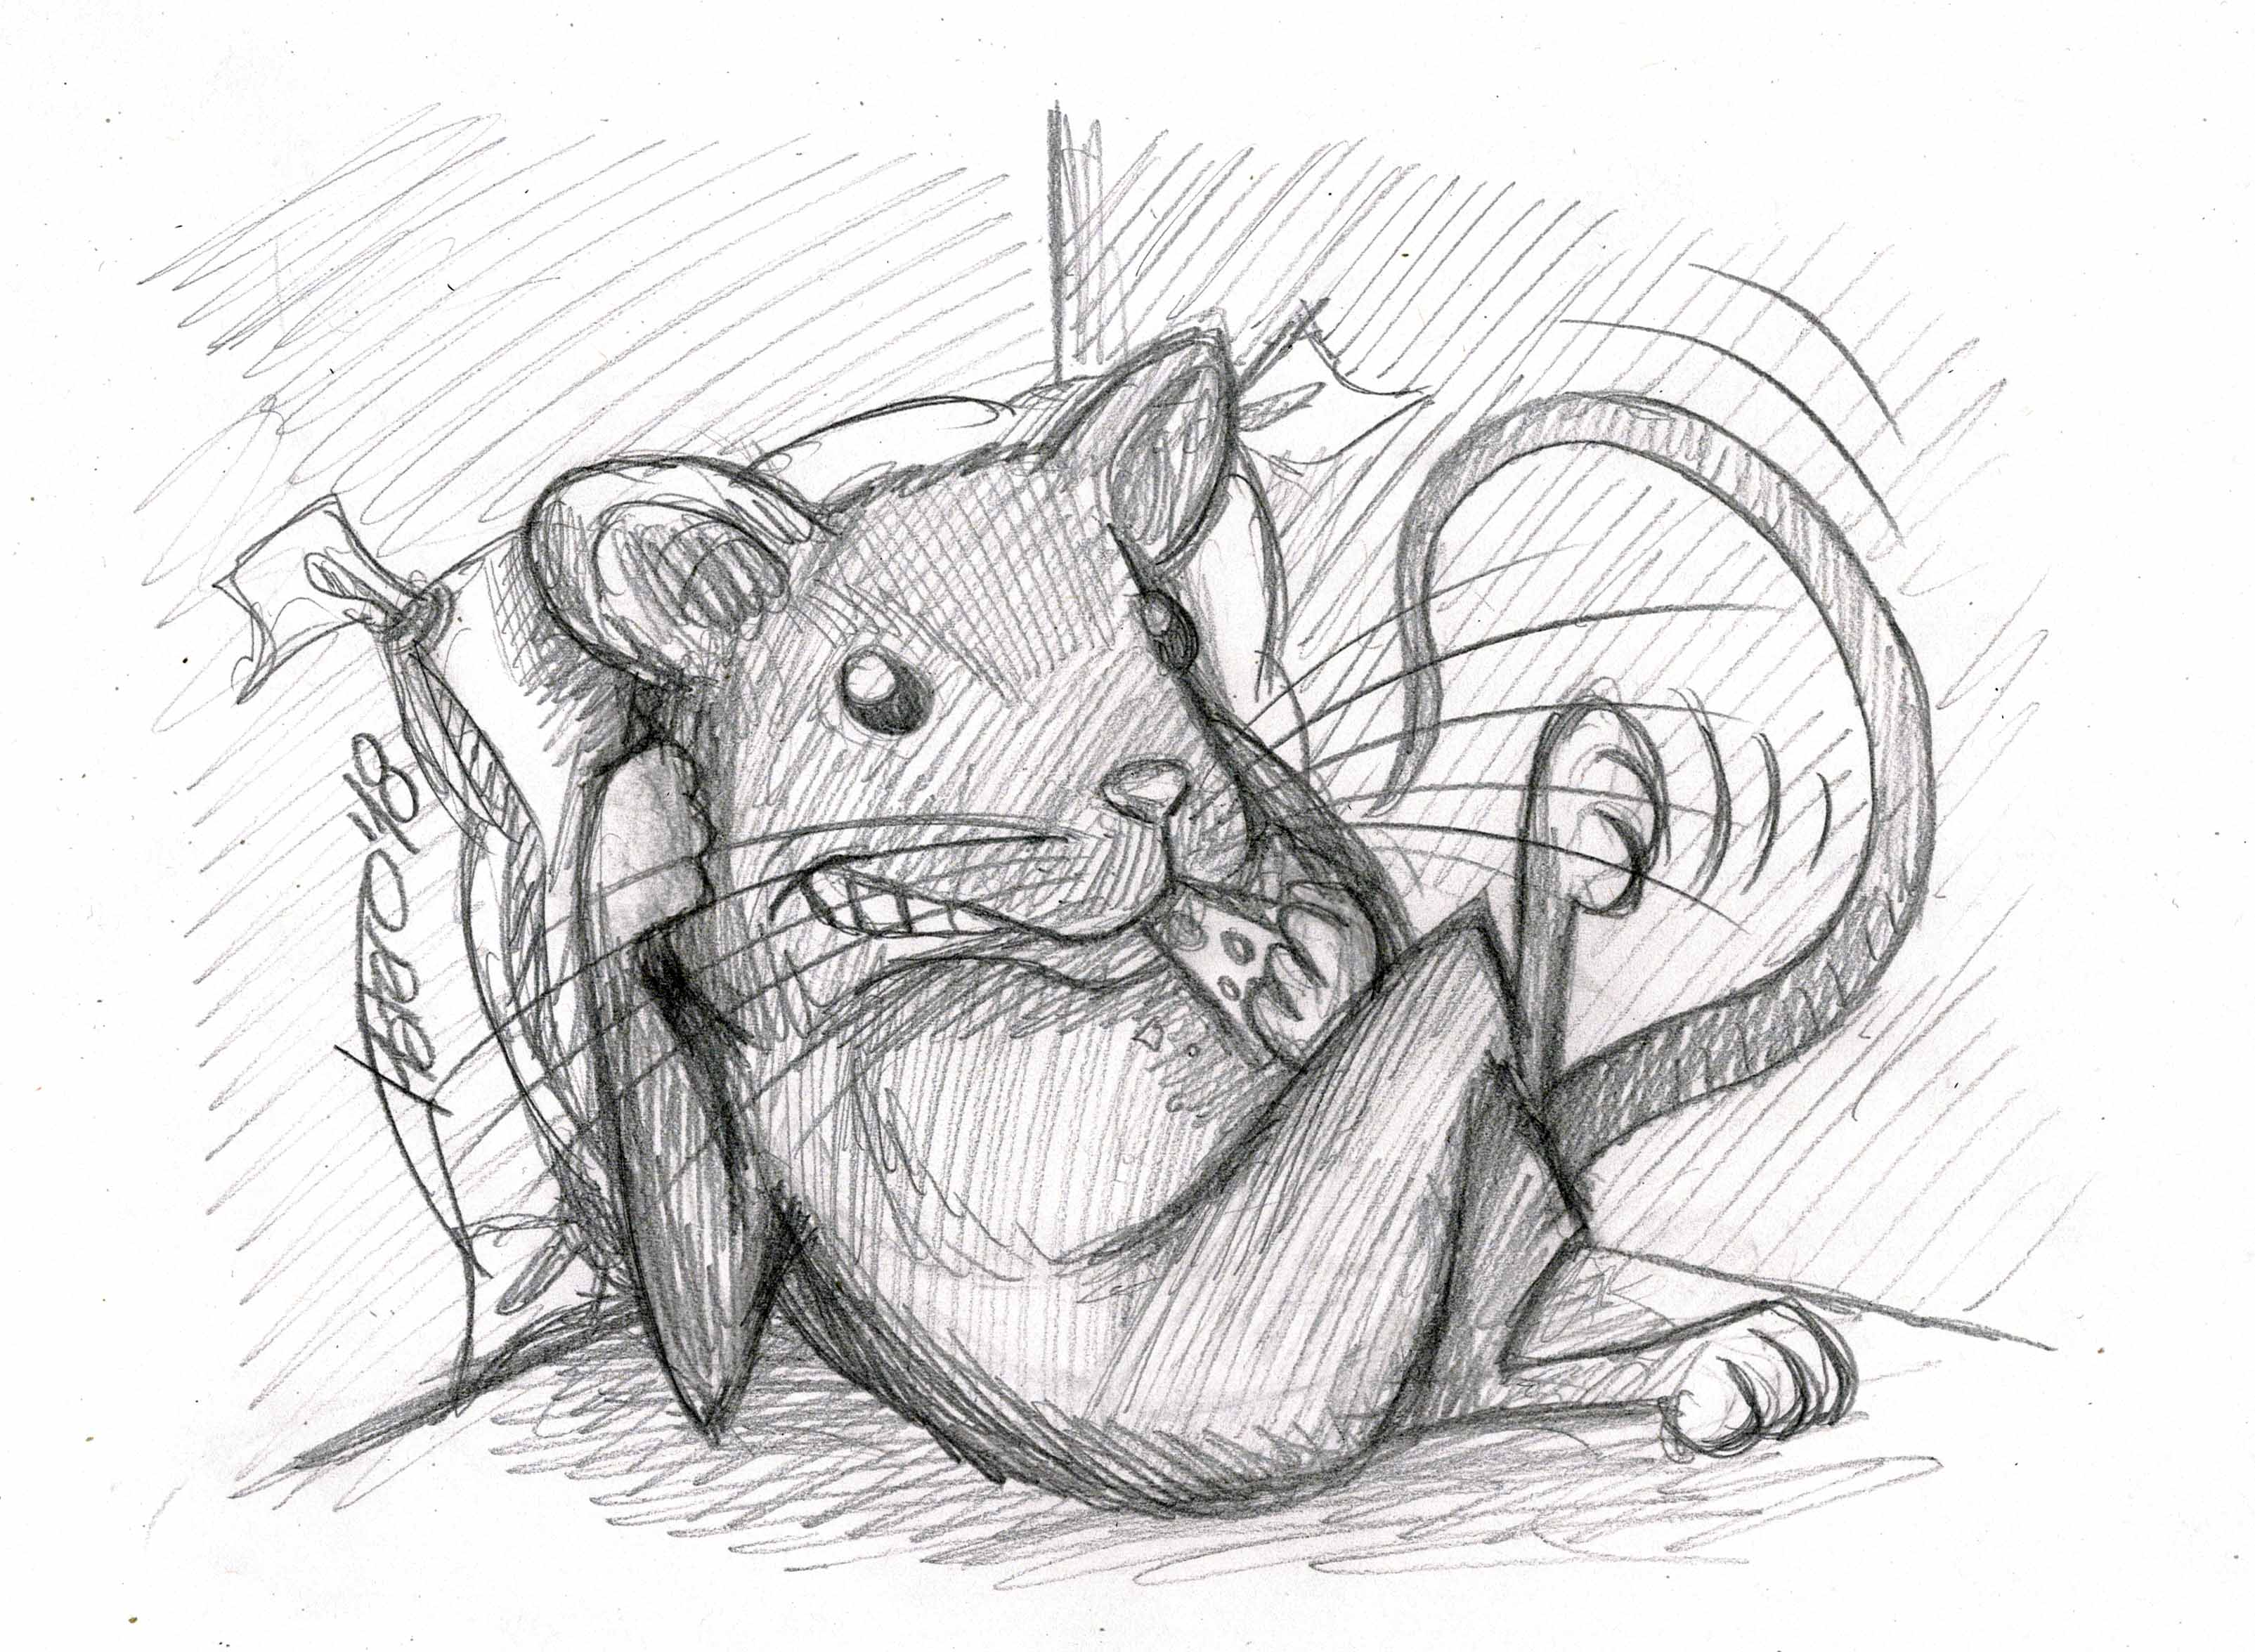 ratón_jose_luis_platero_sketch_dibujo_rata